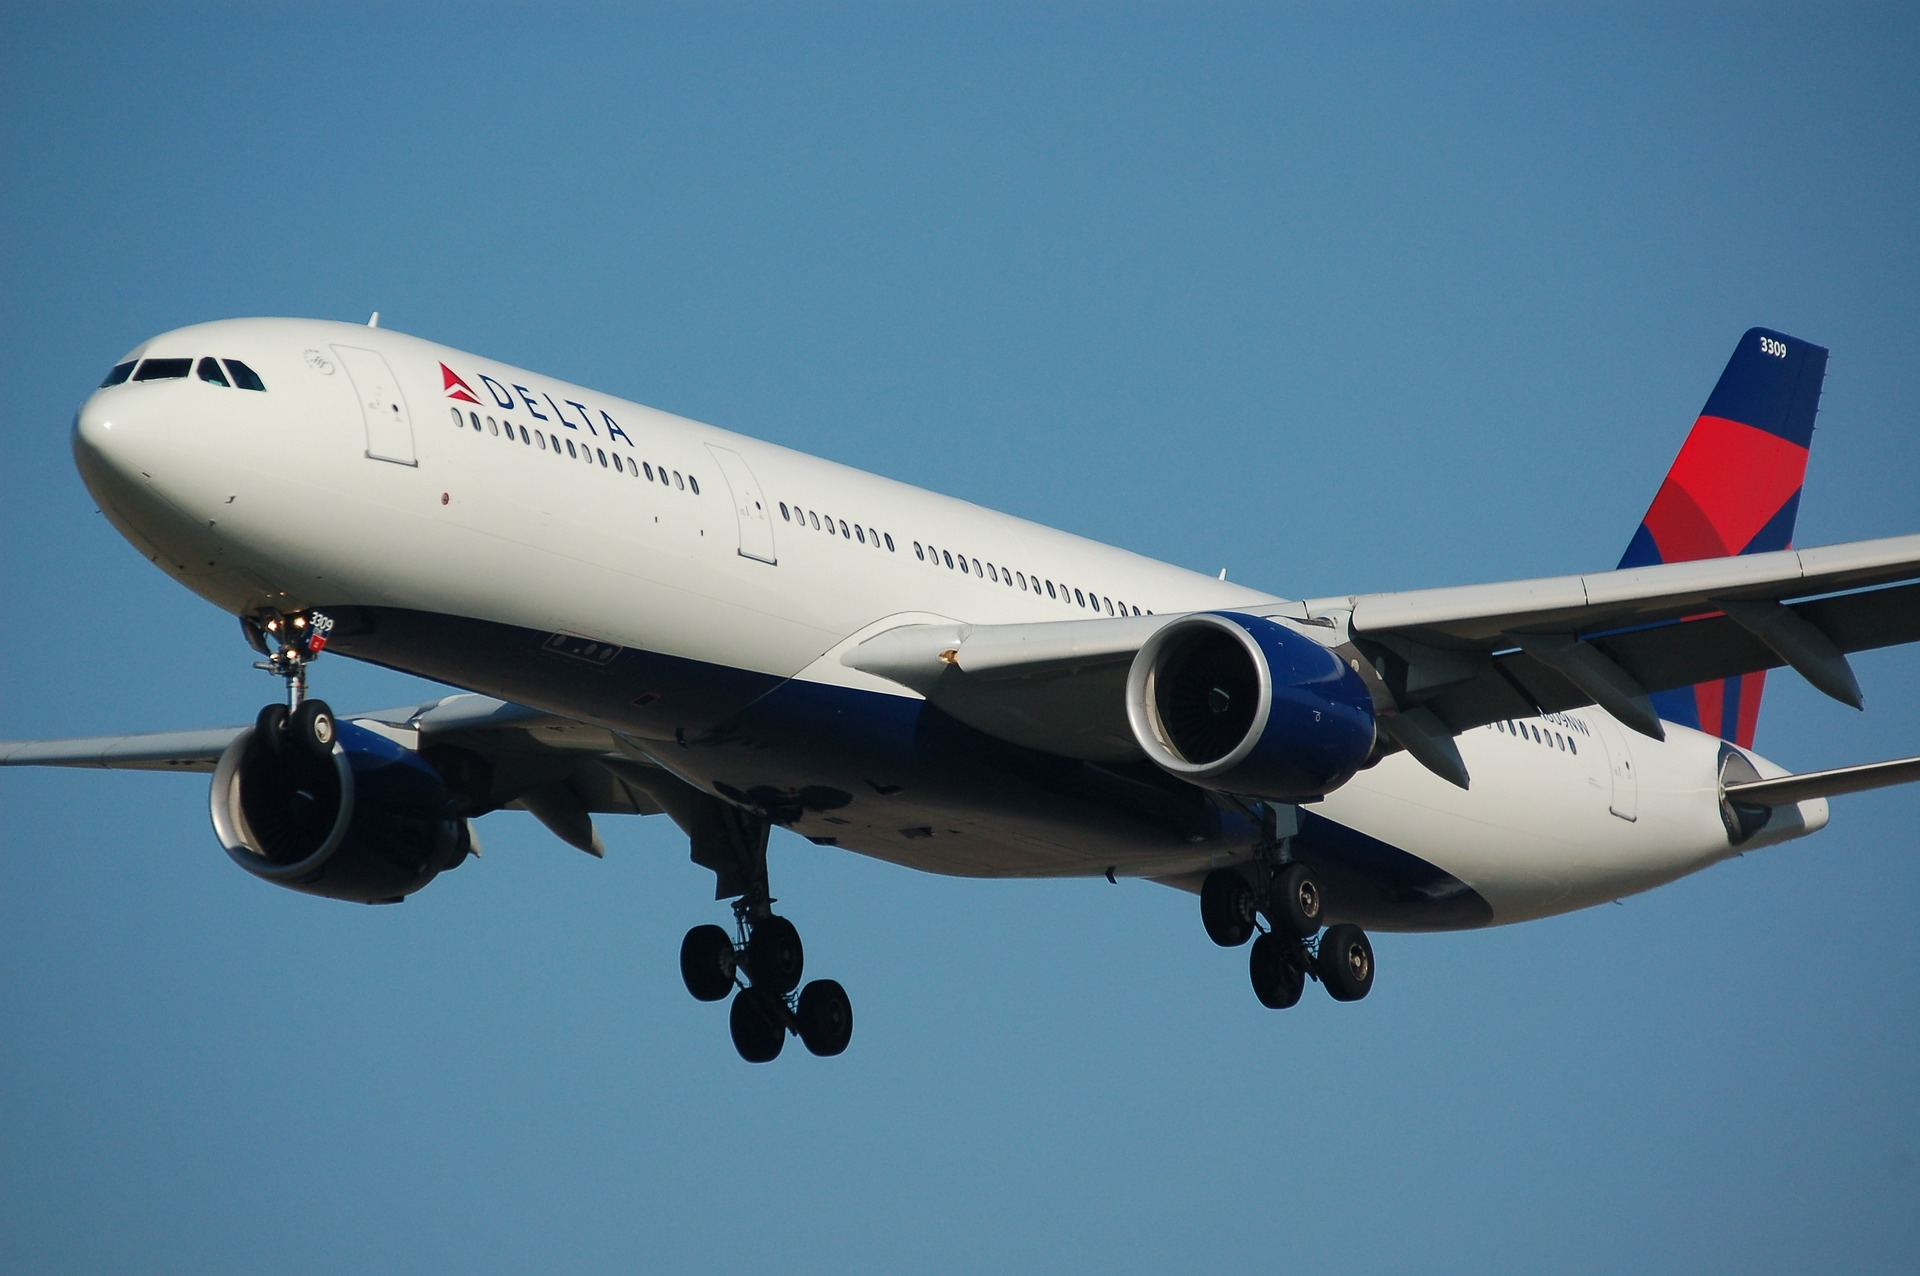 airplane-749542_1920.jpg